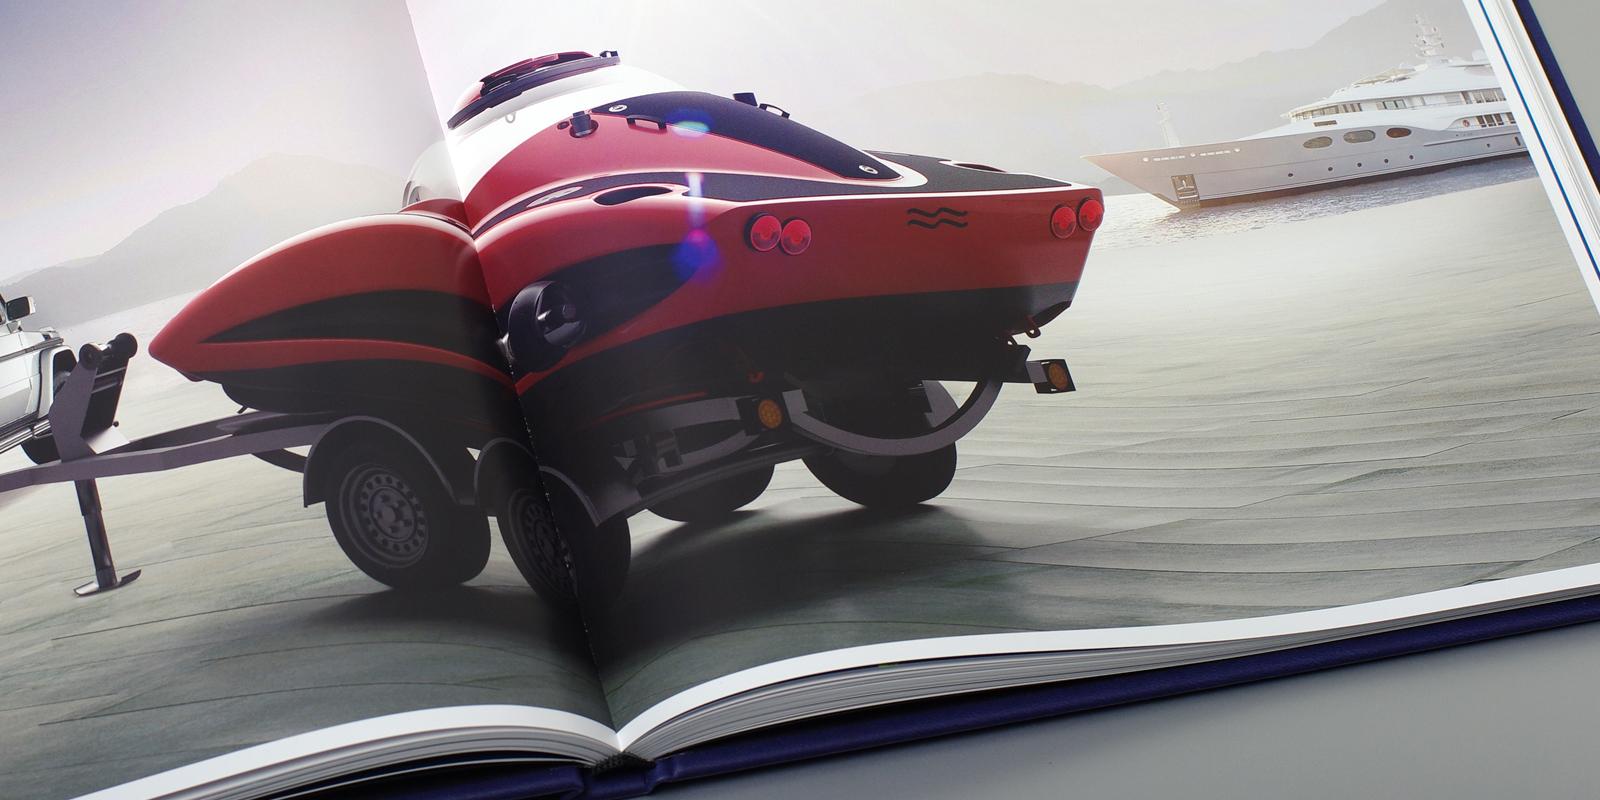 Boek 04 - U-Boat Worx 3D Visuals